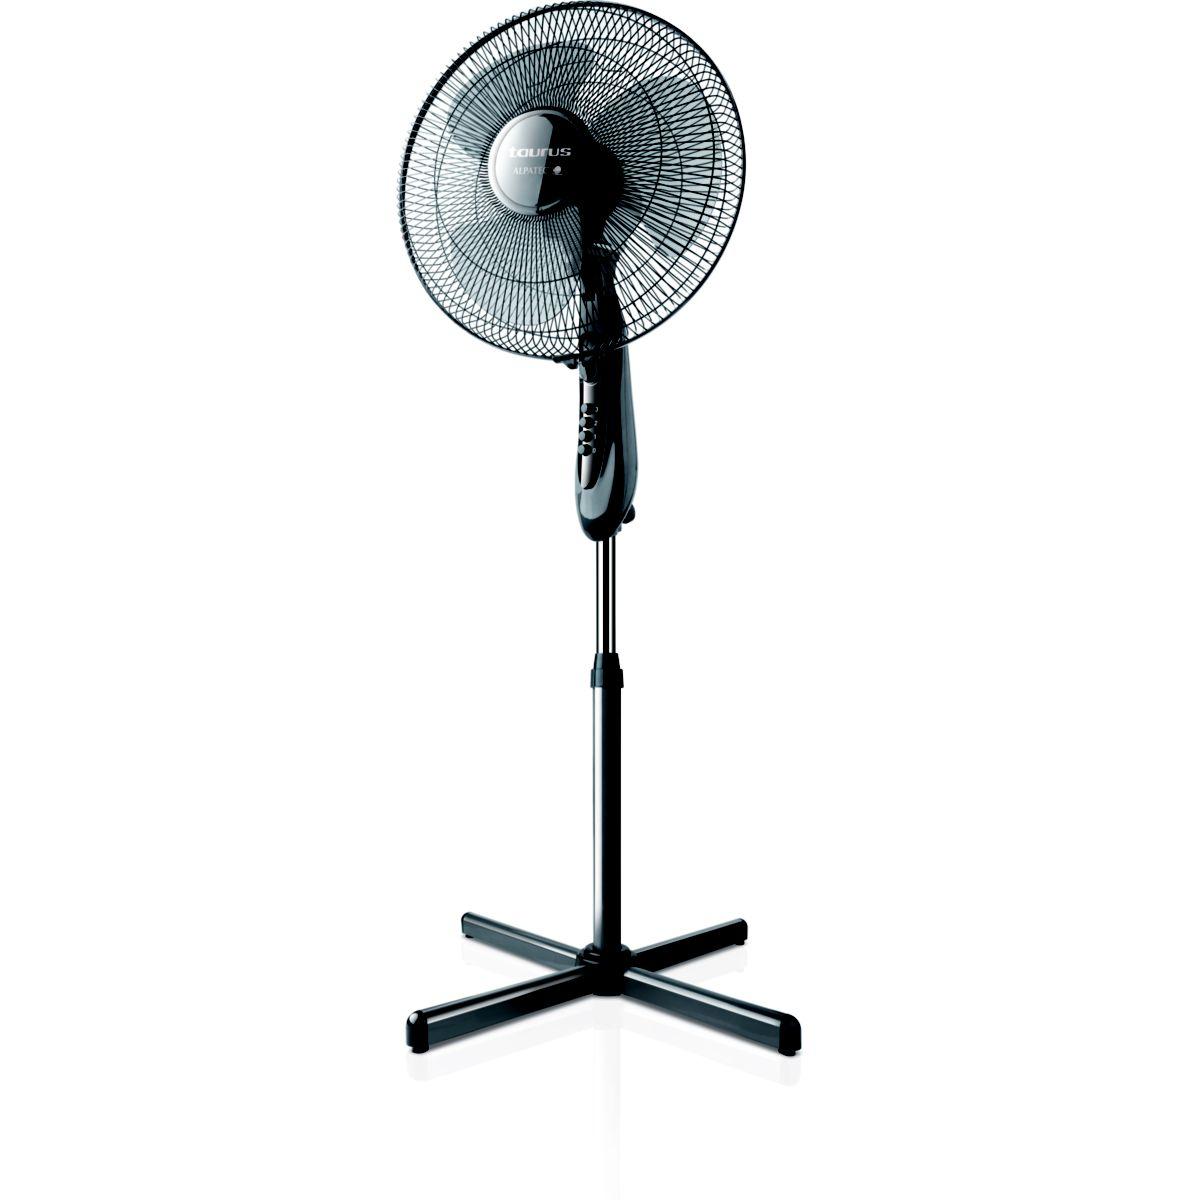 Ventilateur TAURUS BOREAL 16 944628000